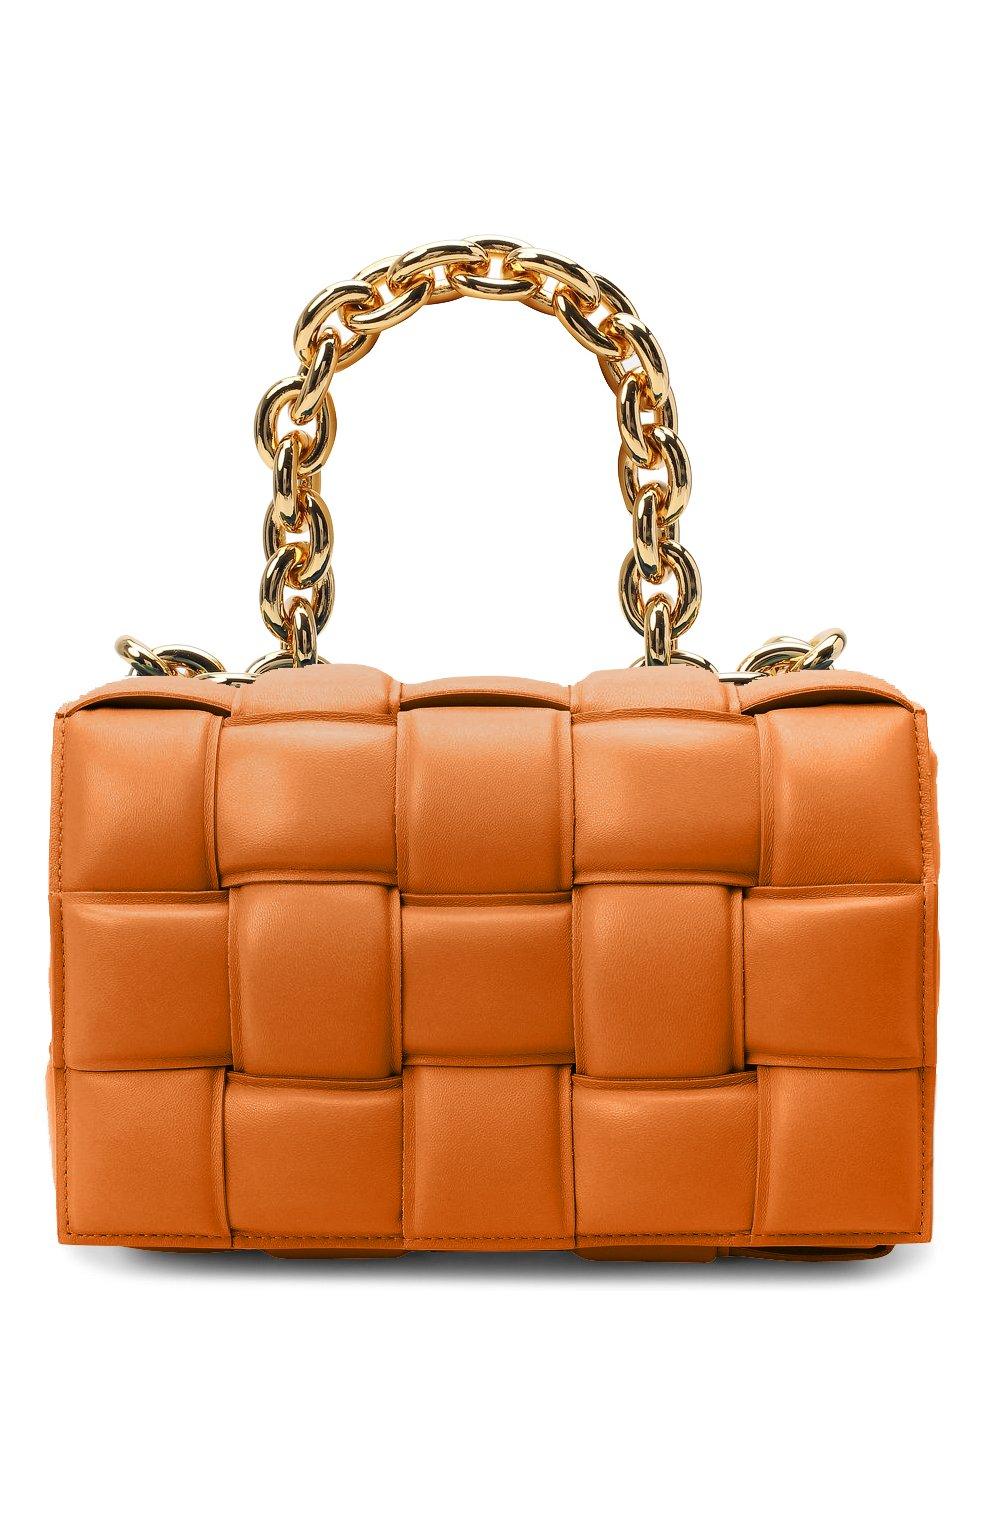 Женская сумка chain cassette BOTTEGA VENETA бежевого цвета, арт. 631421/VBWZ0 | Фото 1